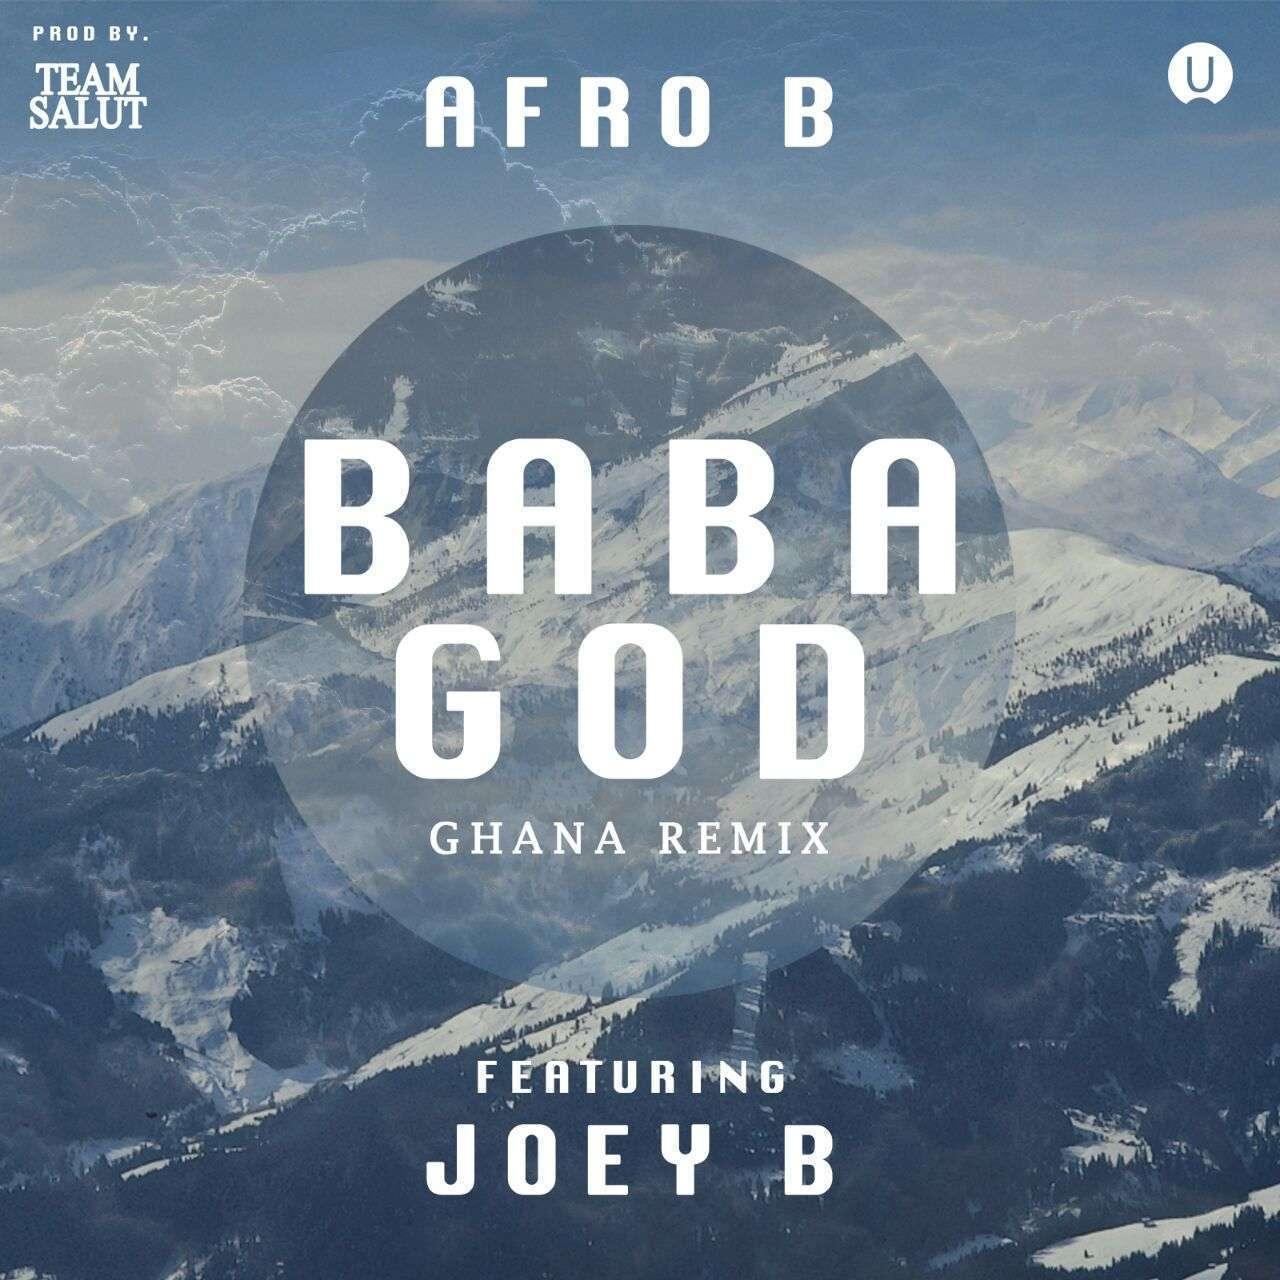 Afro B - Baba God 'Ghana Remix' Ft Joey B